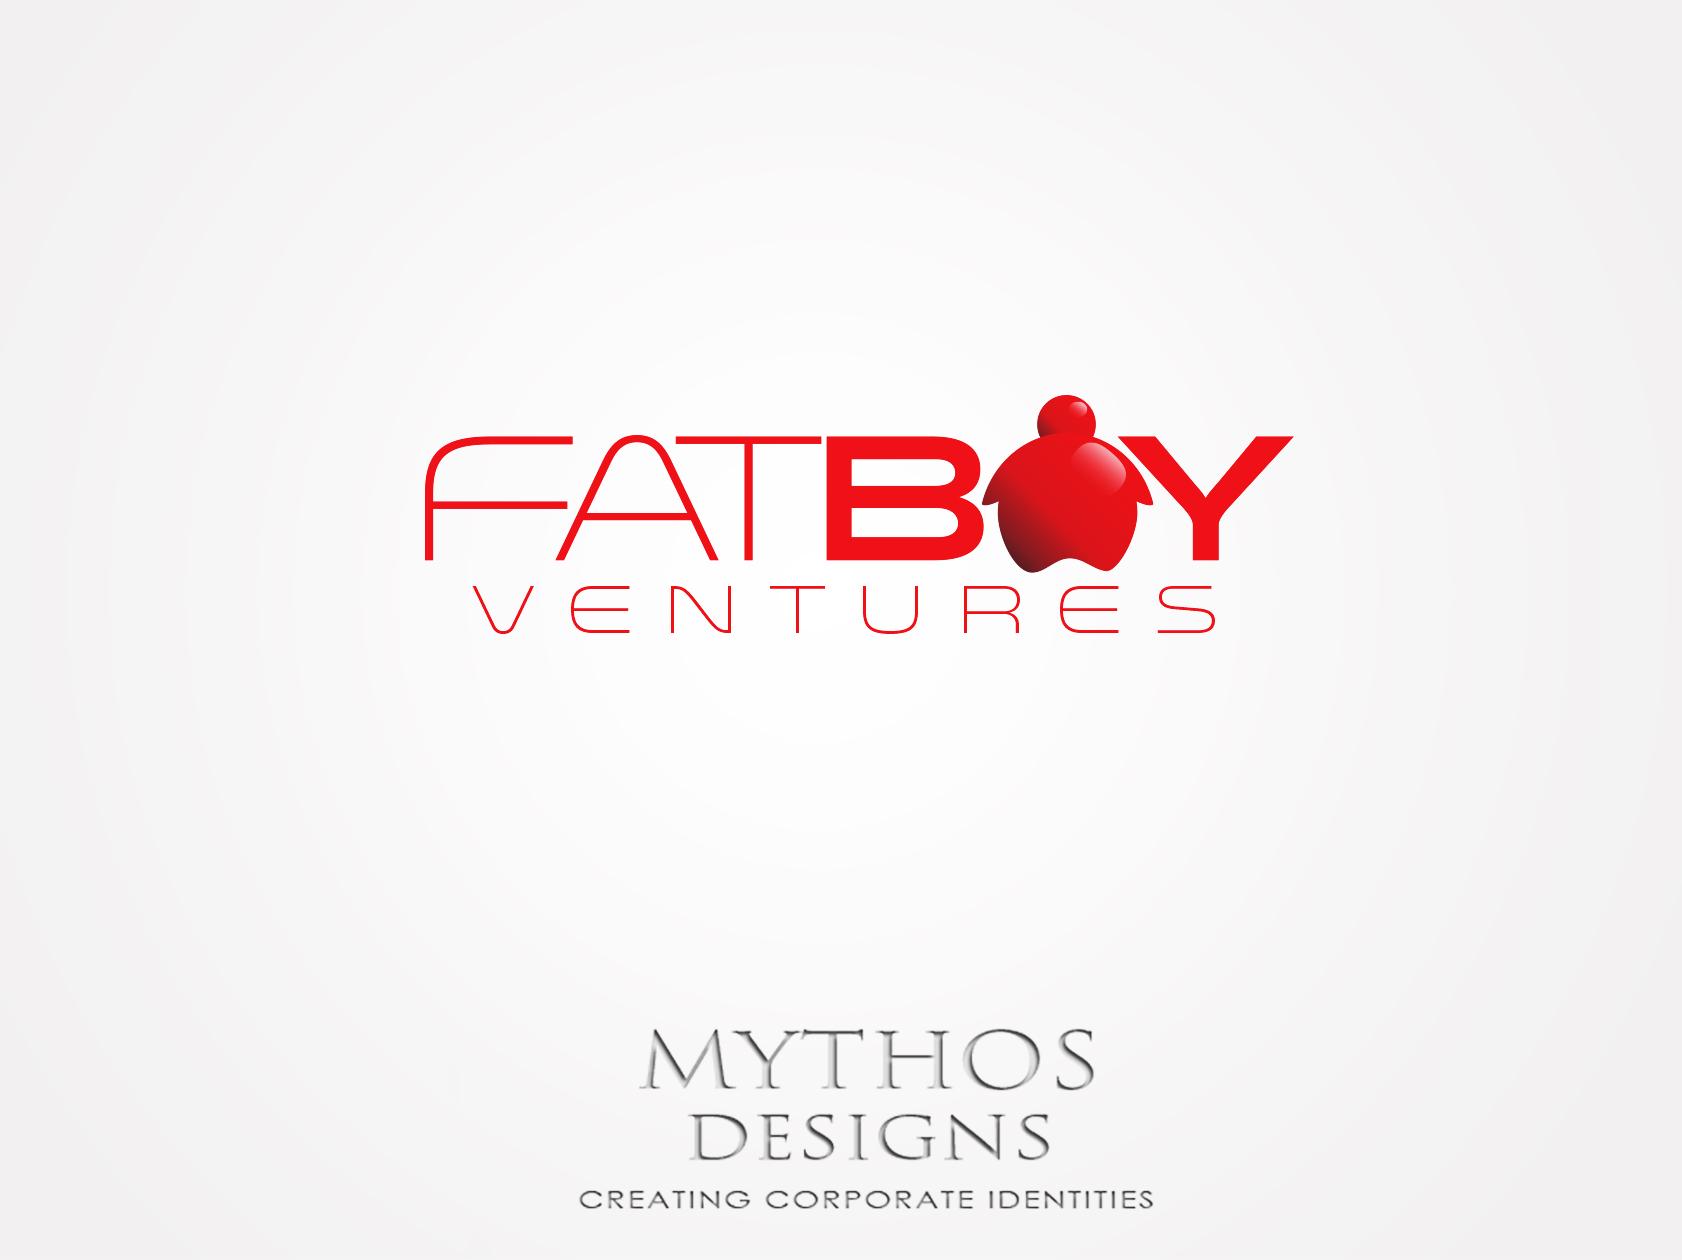 Logo Design by Mythos Designs - Entry No. 90 in the Logo Design Contest Fun Logo Design for Fat Boy Ventures.